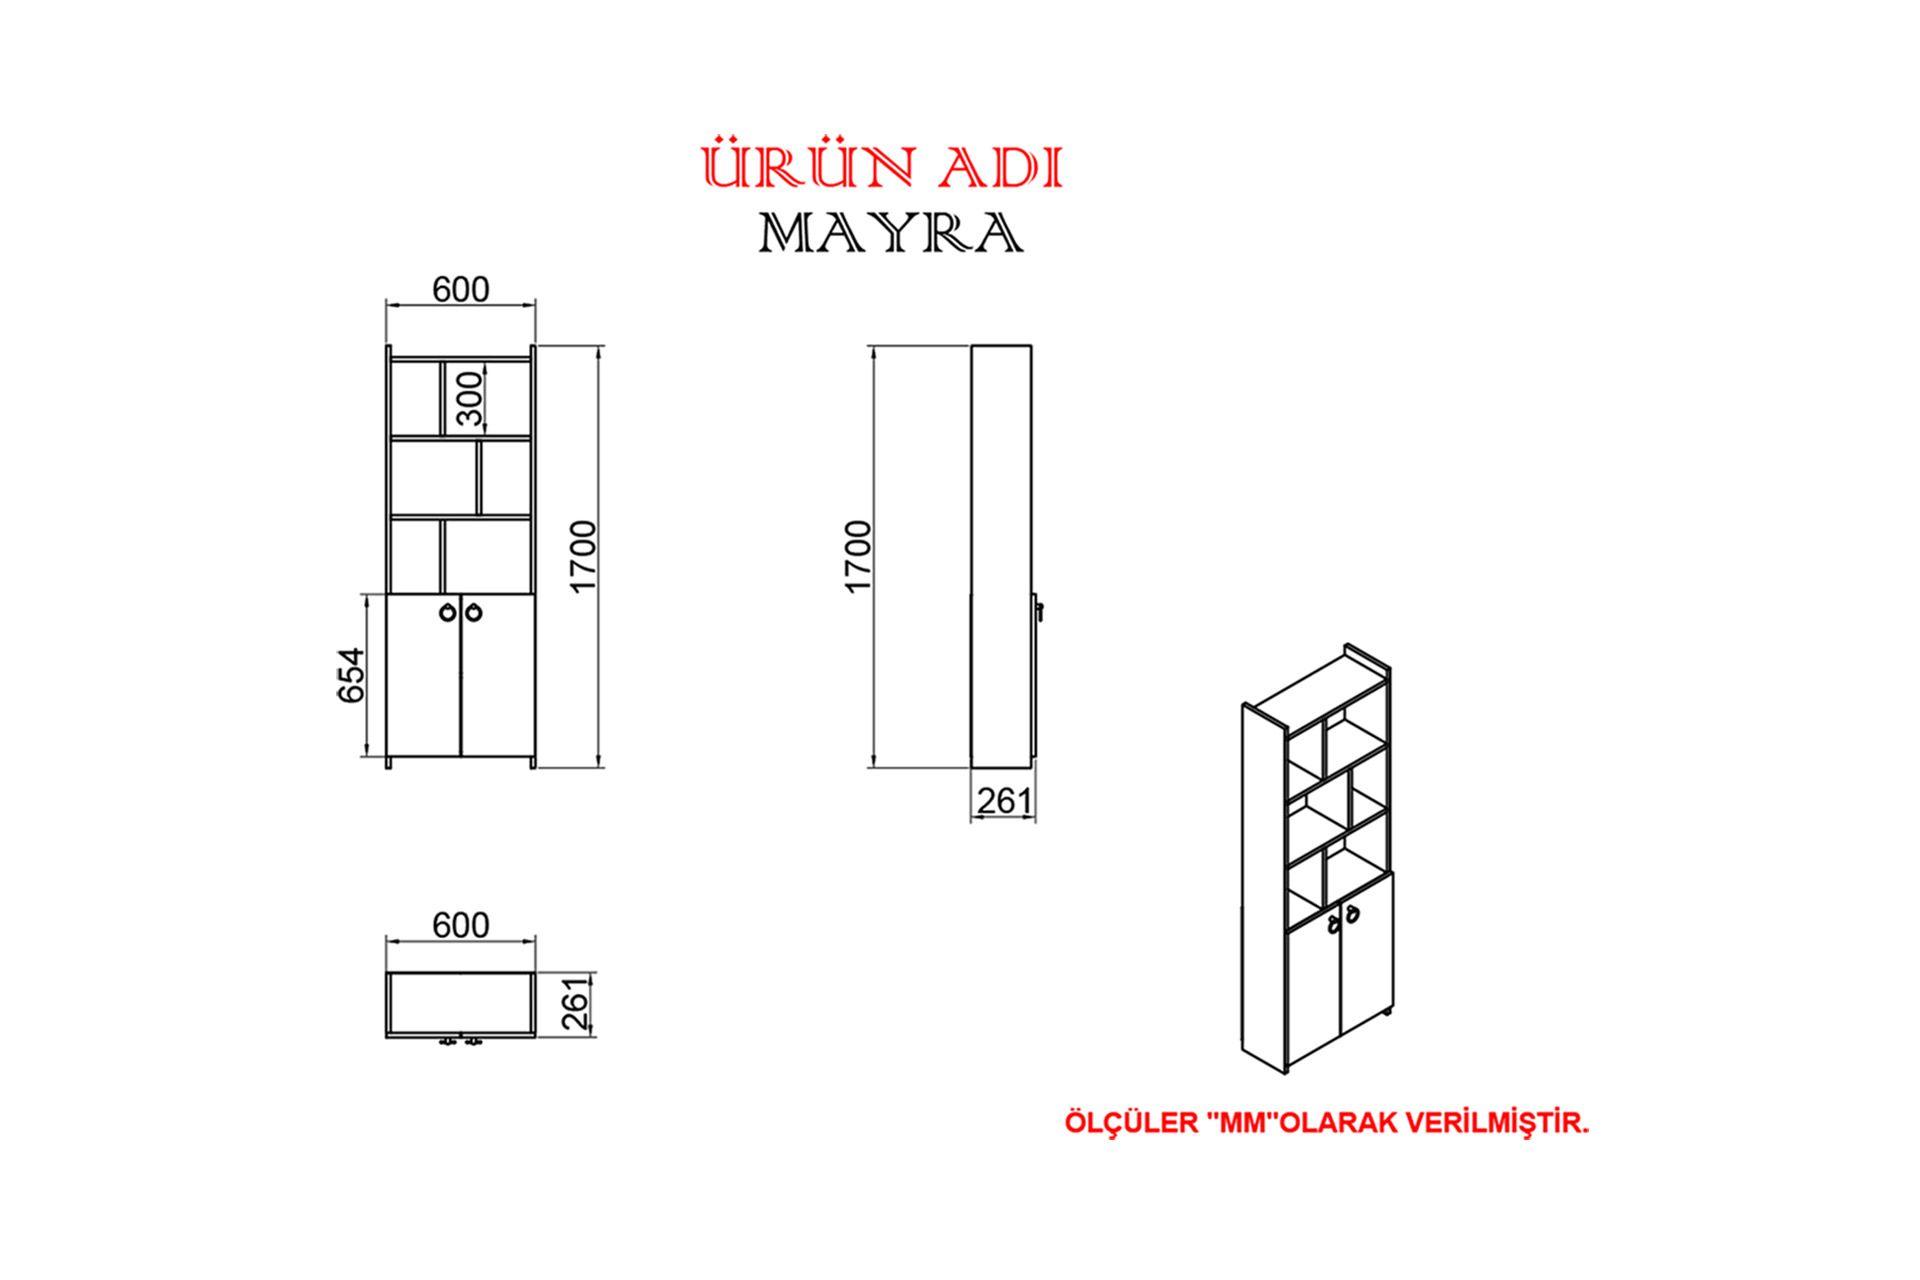 KALENDER DEKOR JİMMY MAYRA 90 CM ÇALIŞMA MASASI TAKIMI JMM05